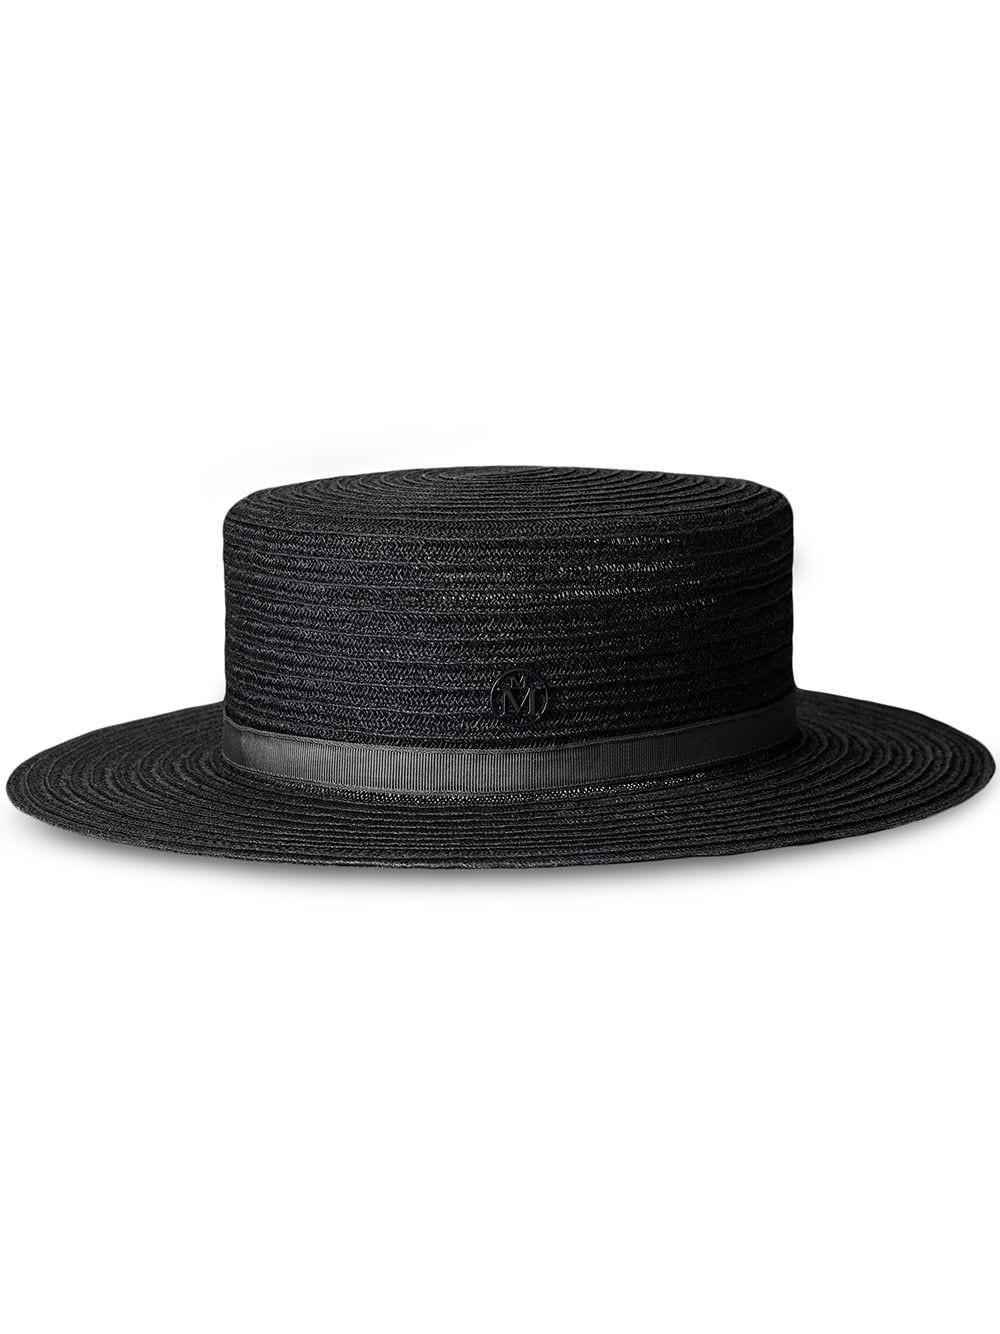 KIKI HAT 21PS STRAW BLACK